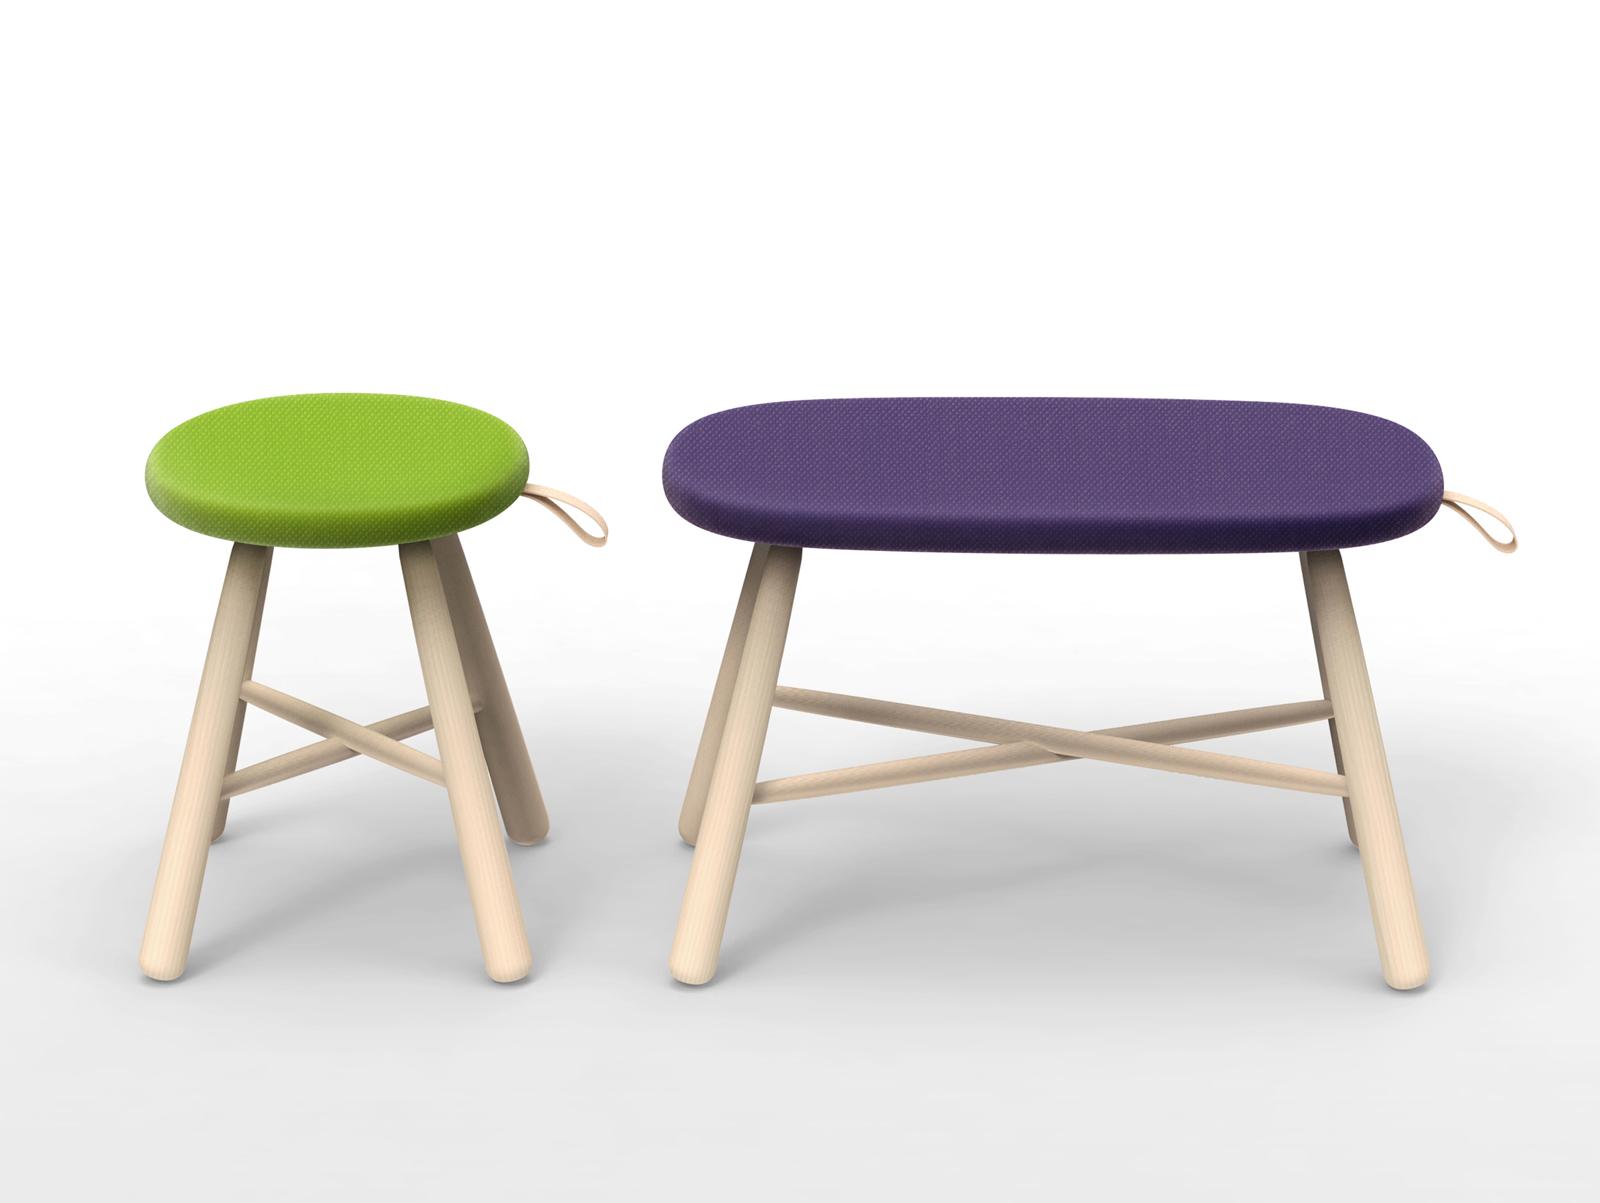 "<a href=""http://www.iwasaki-design-studio.net/"">Ichiro Iwasaki</a>'s Tag stool for Discipline."